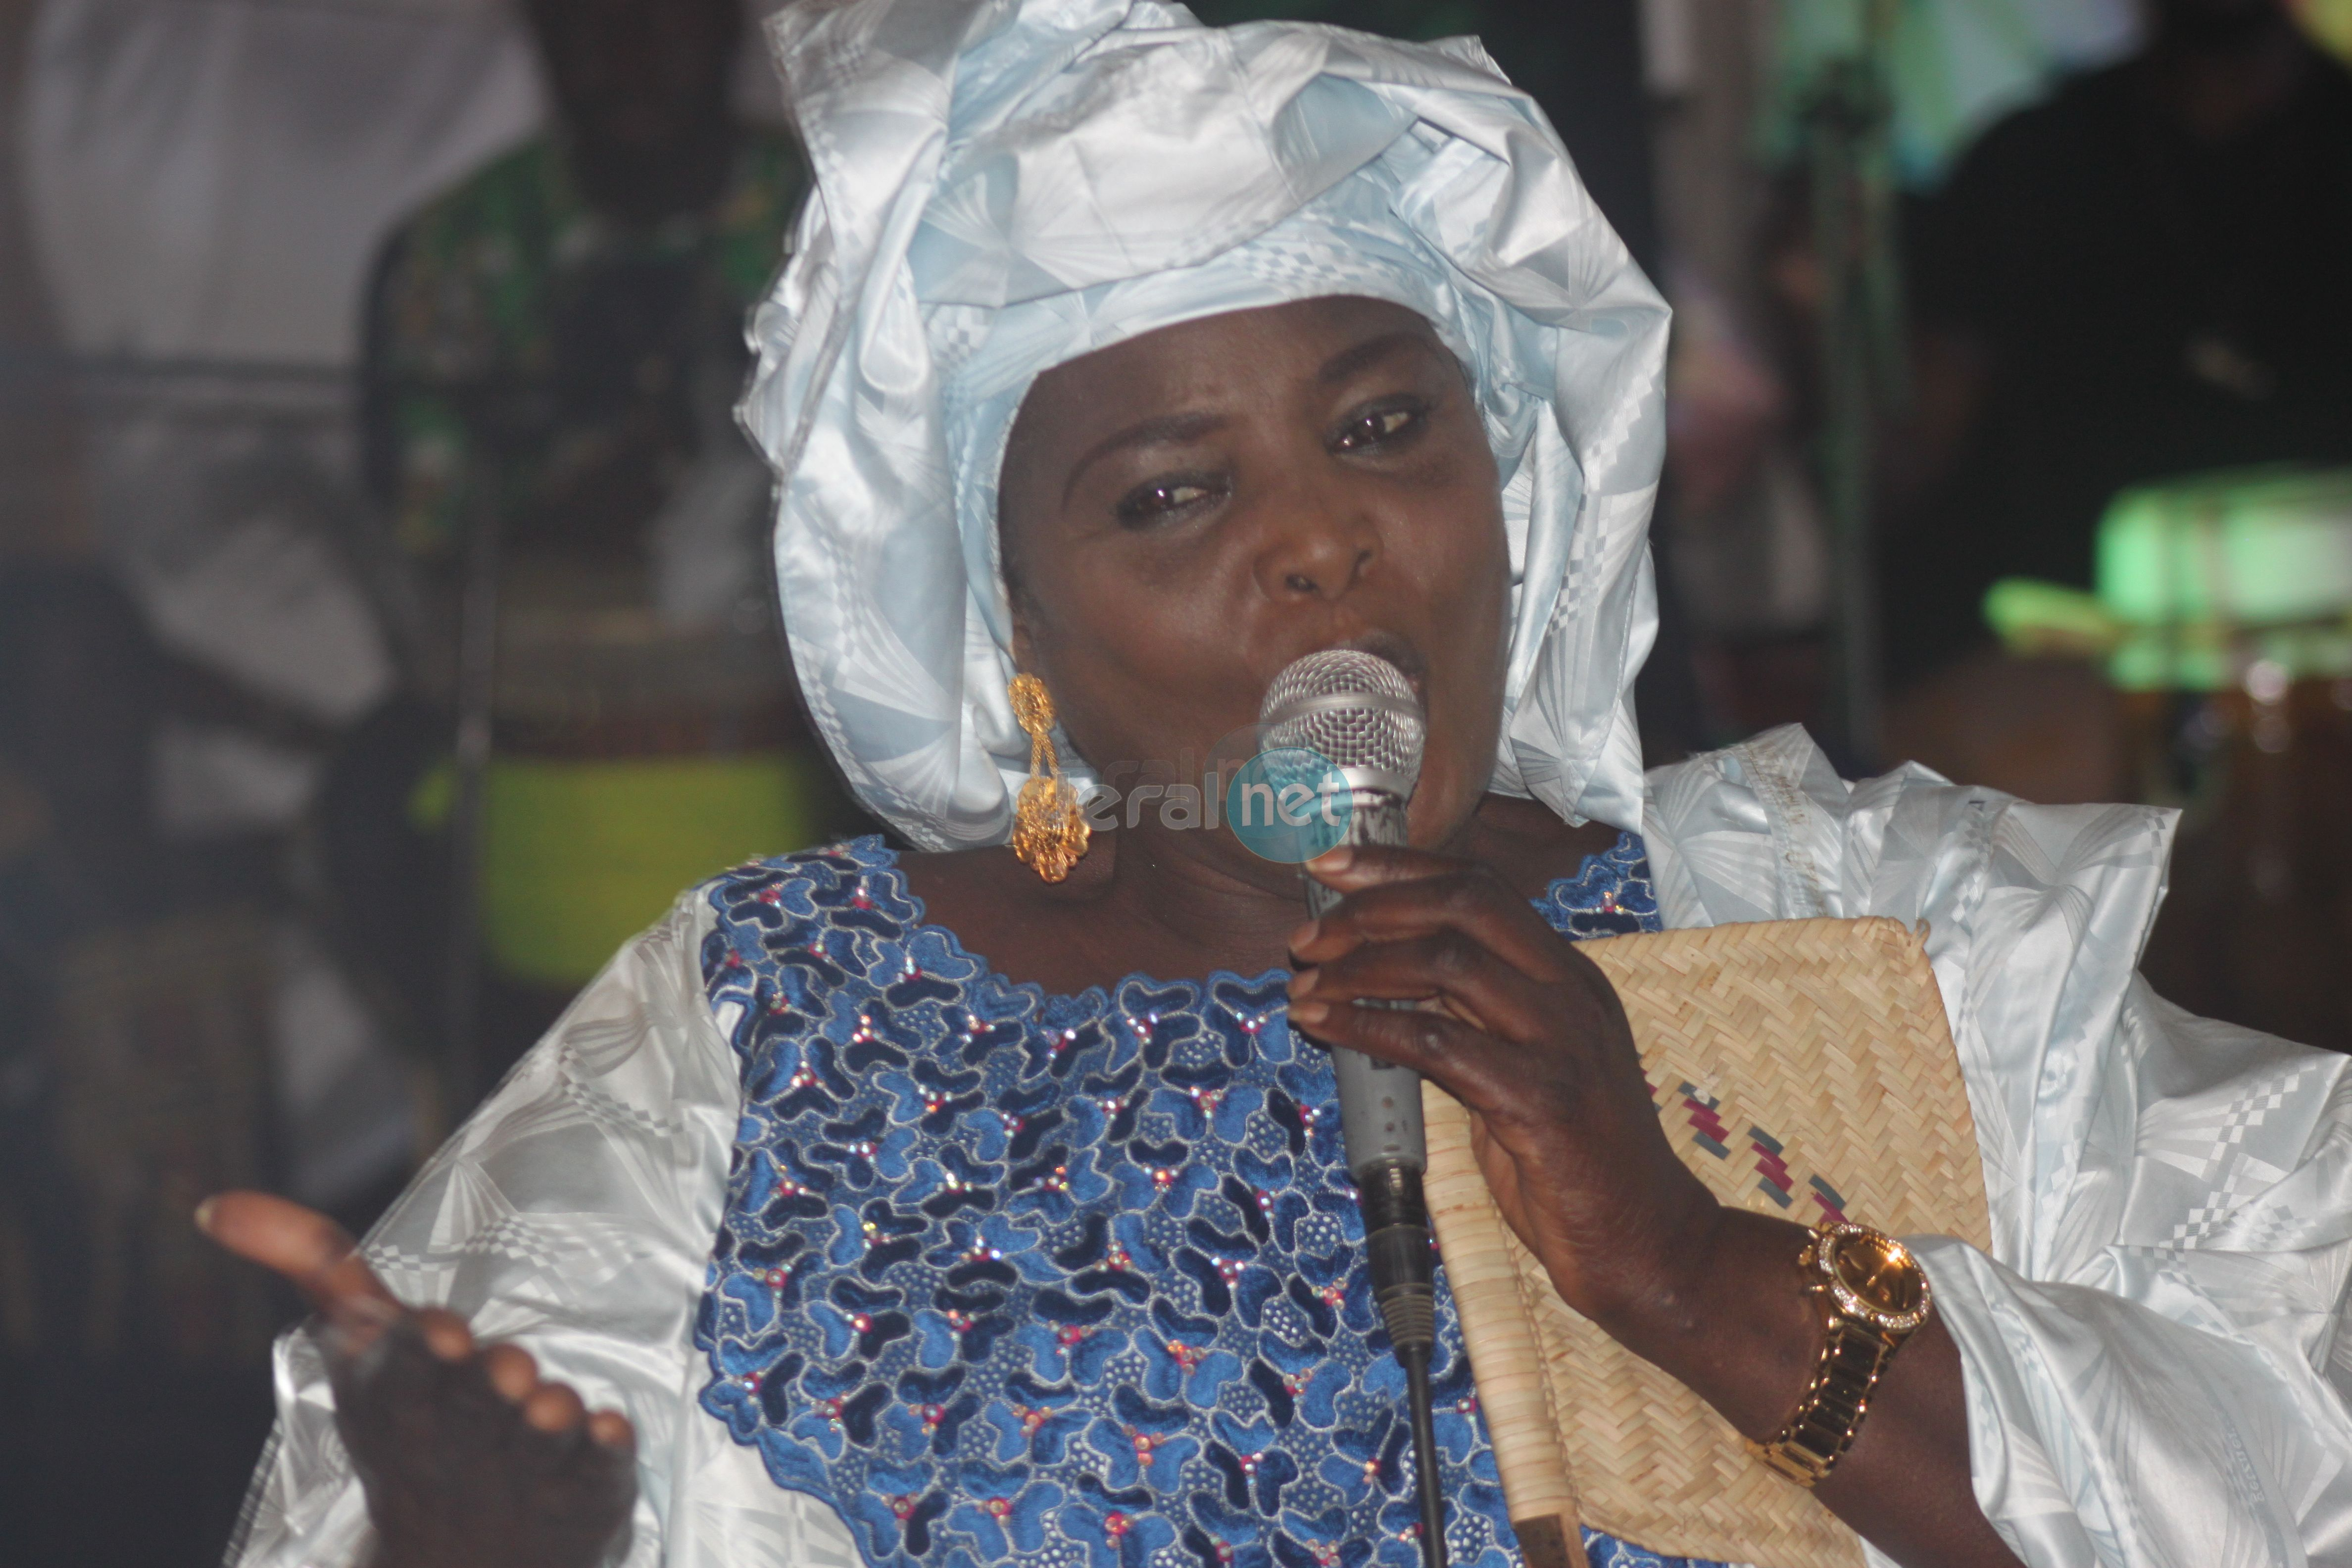 La maman à Coumba Gawlo Seck, Adja  Fatou Kiné Mbaye en quelques clichés